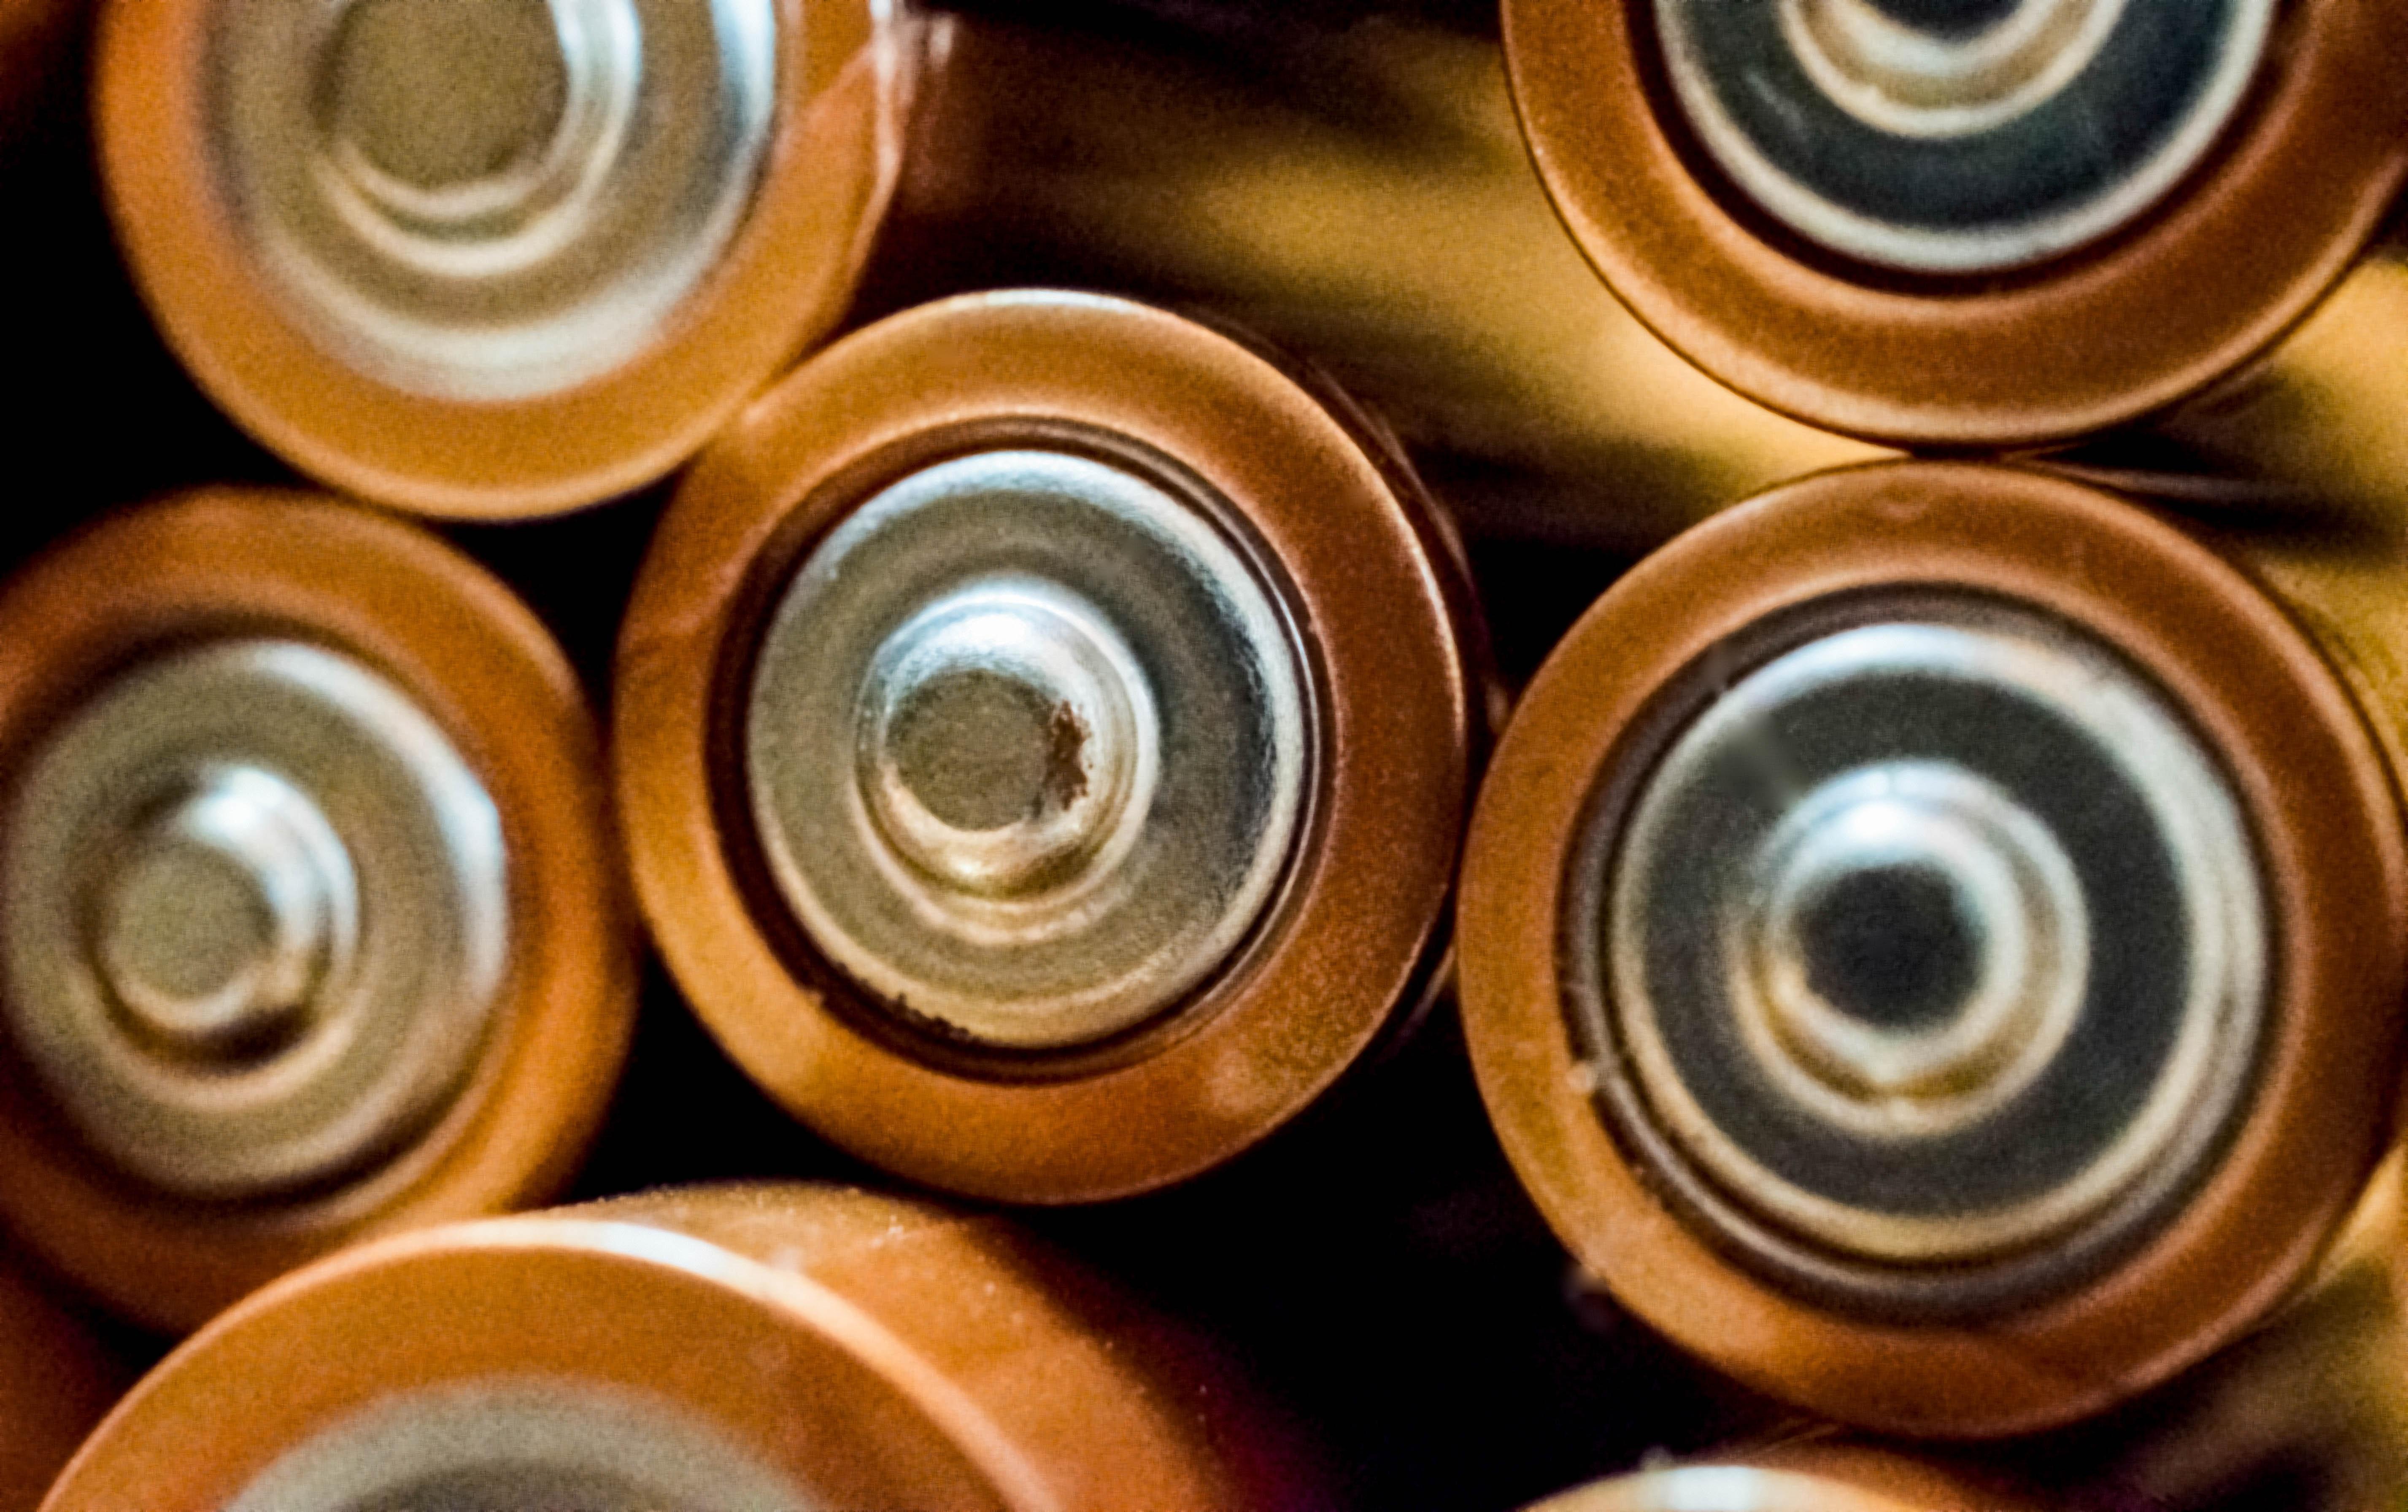 Nio, Sinopec start battery swap, smart EV partnership